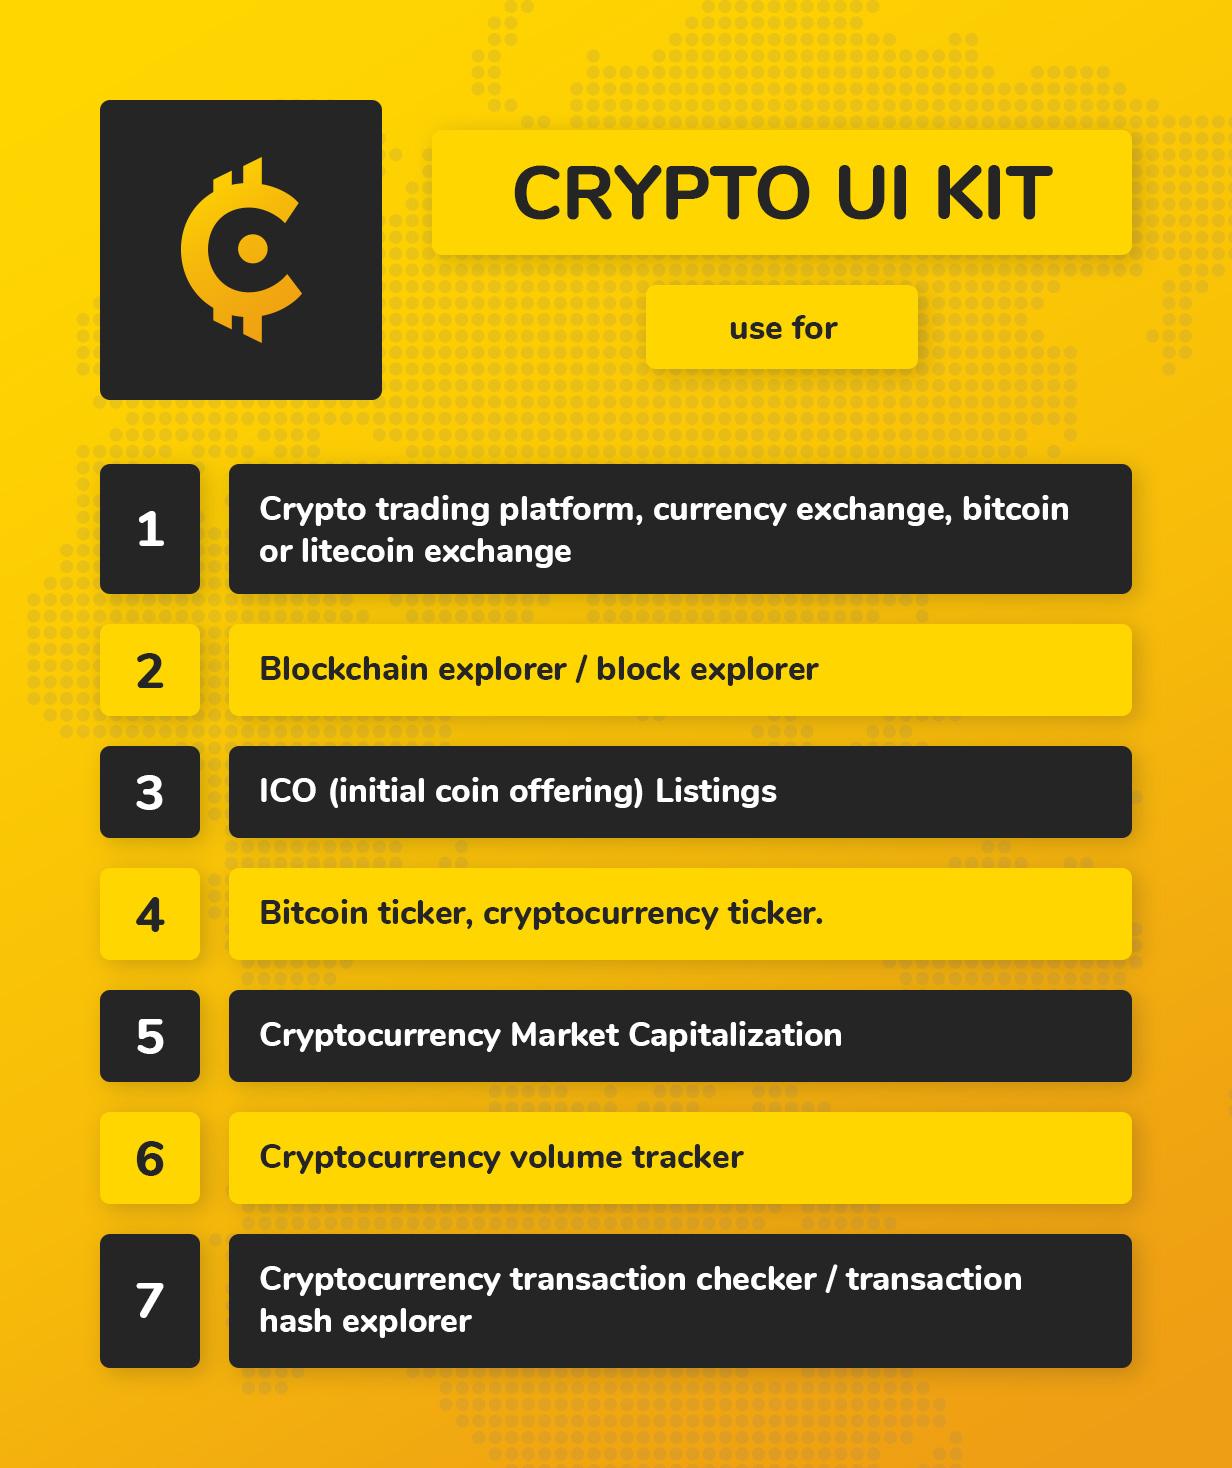 banner00 edit1 - Cryptic - Crypto UI Kit